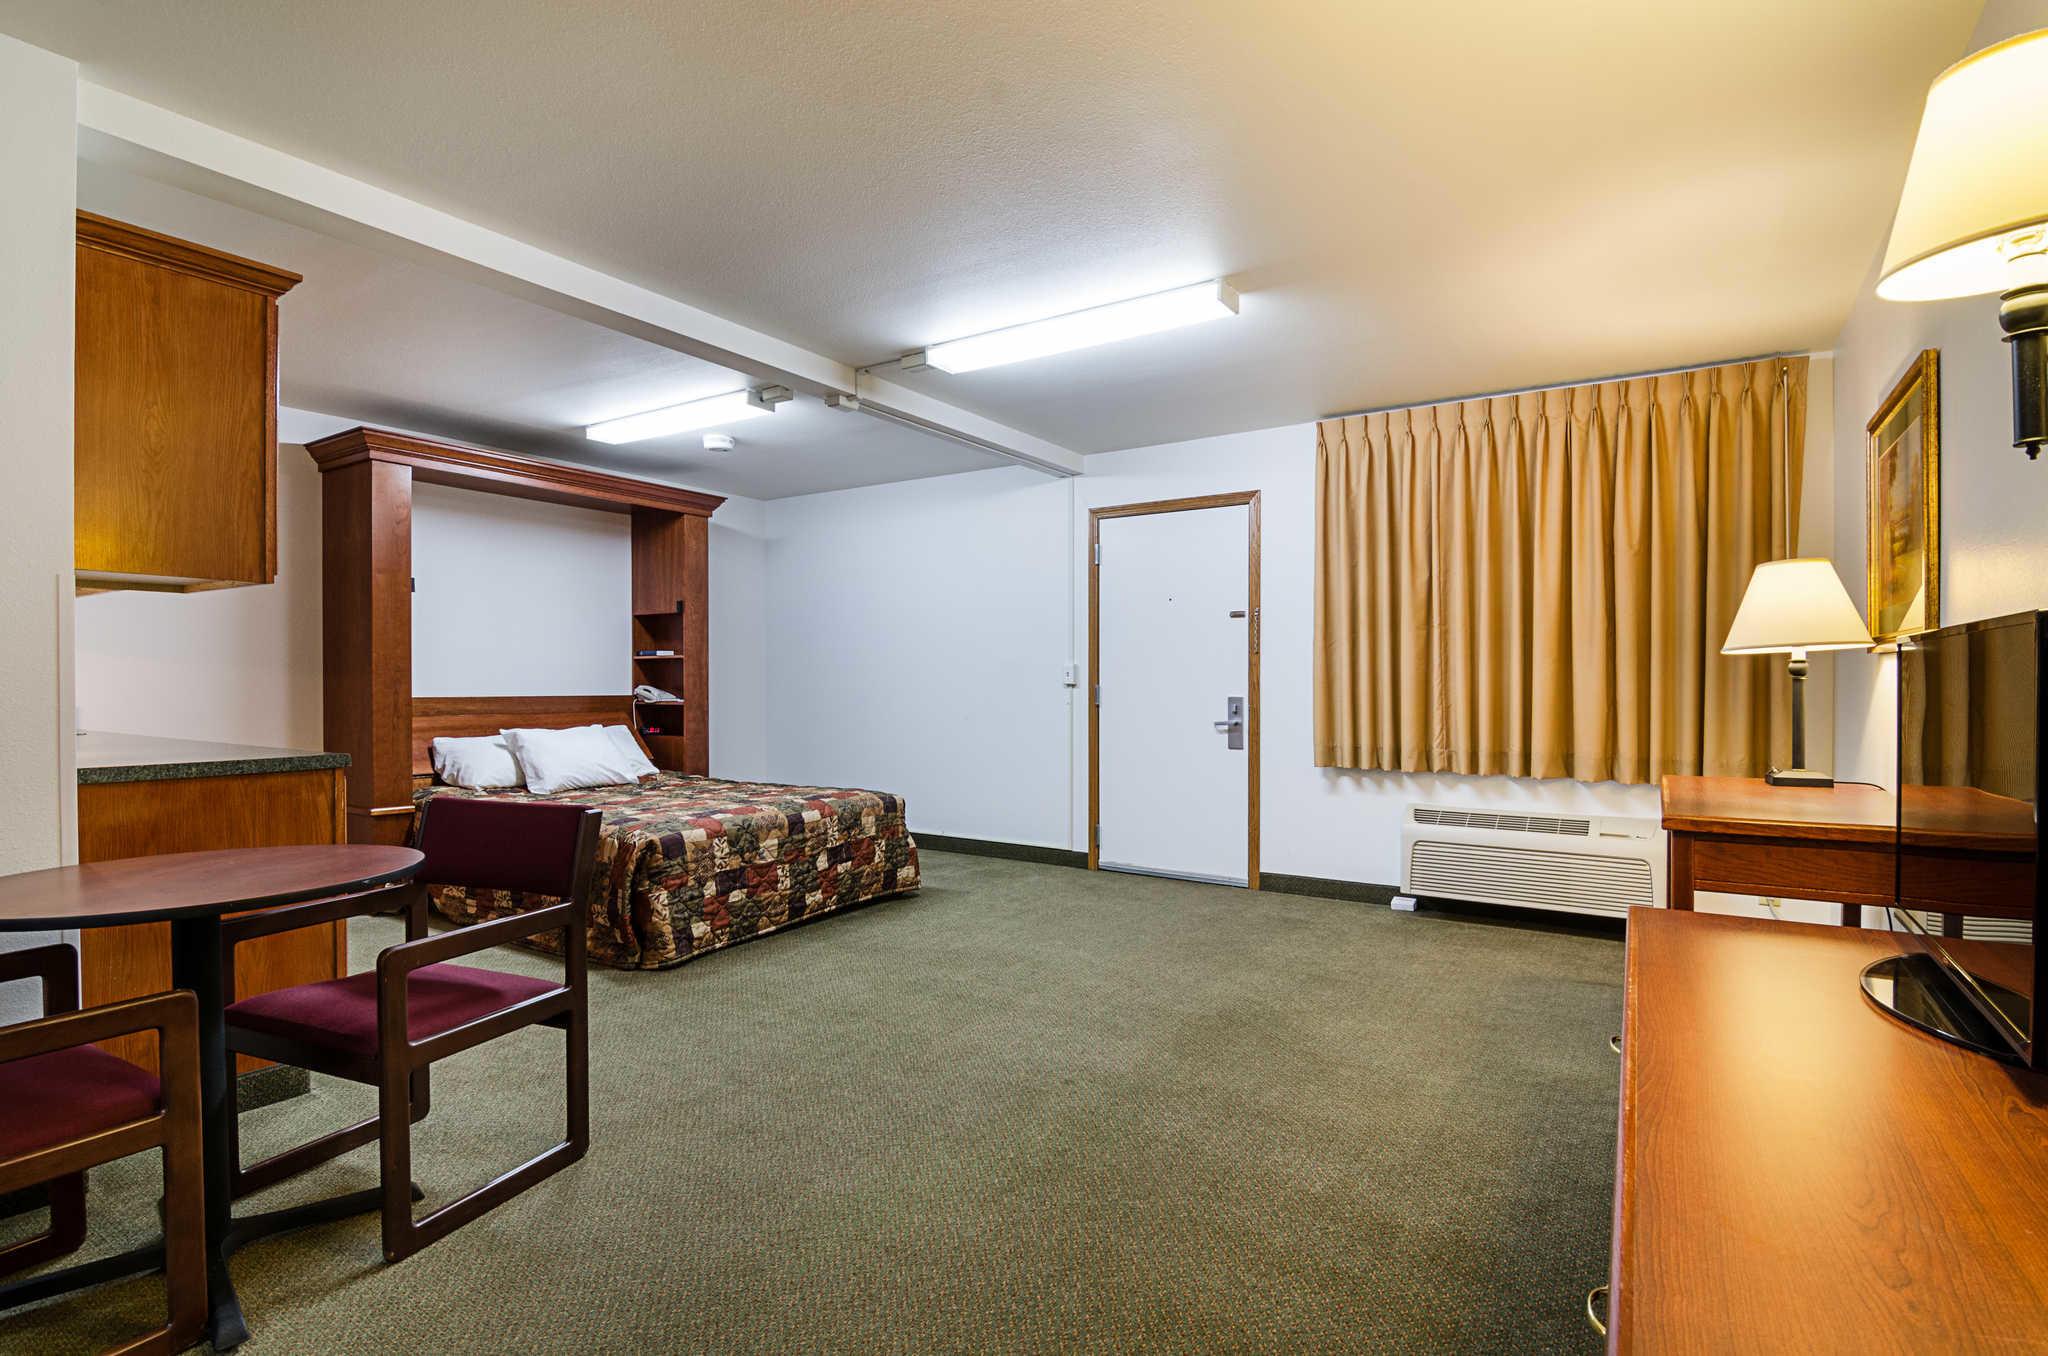 Rodeway Inn image 20